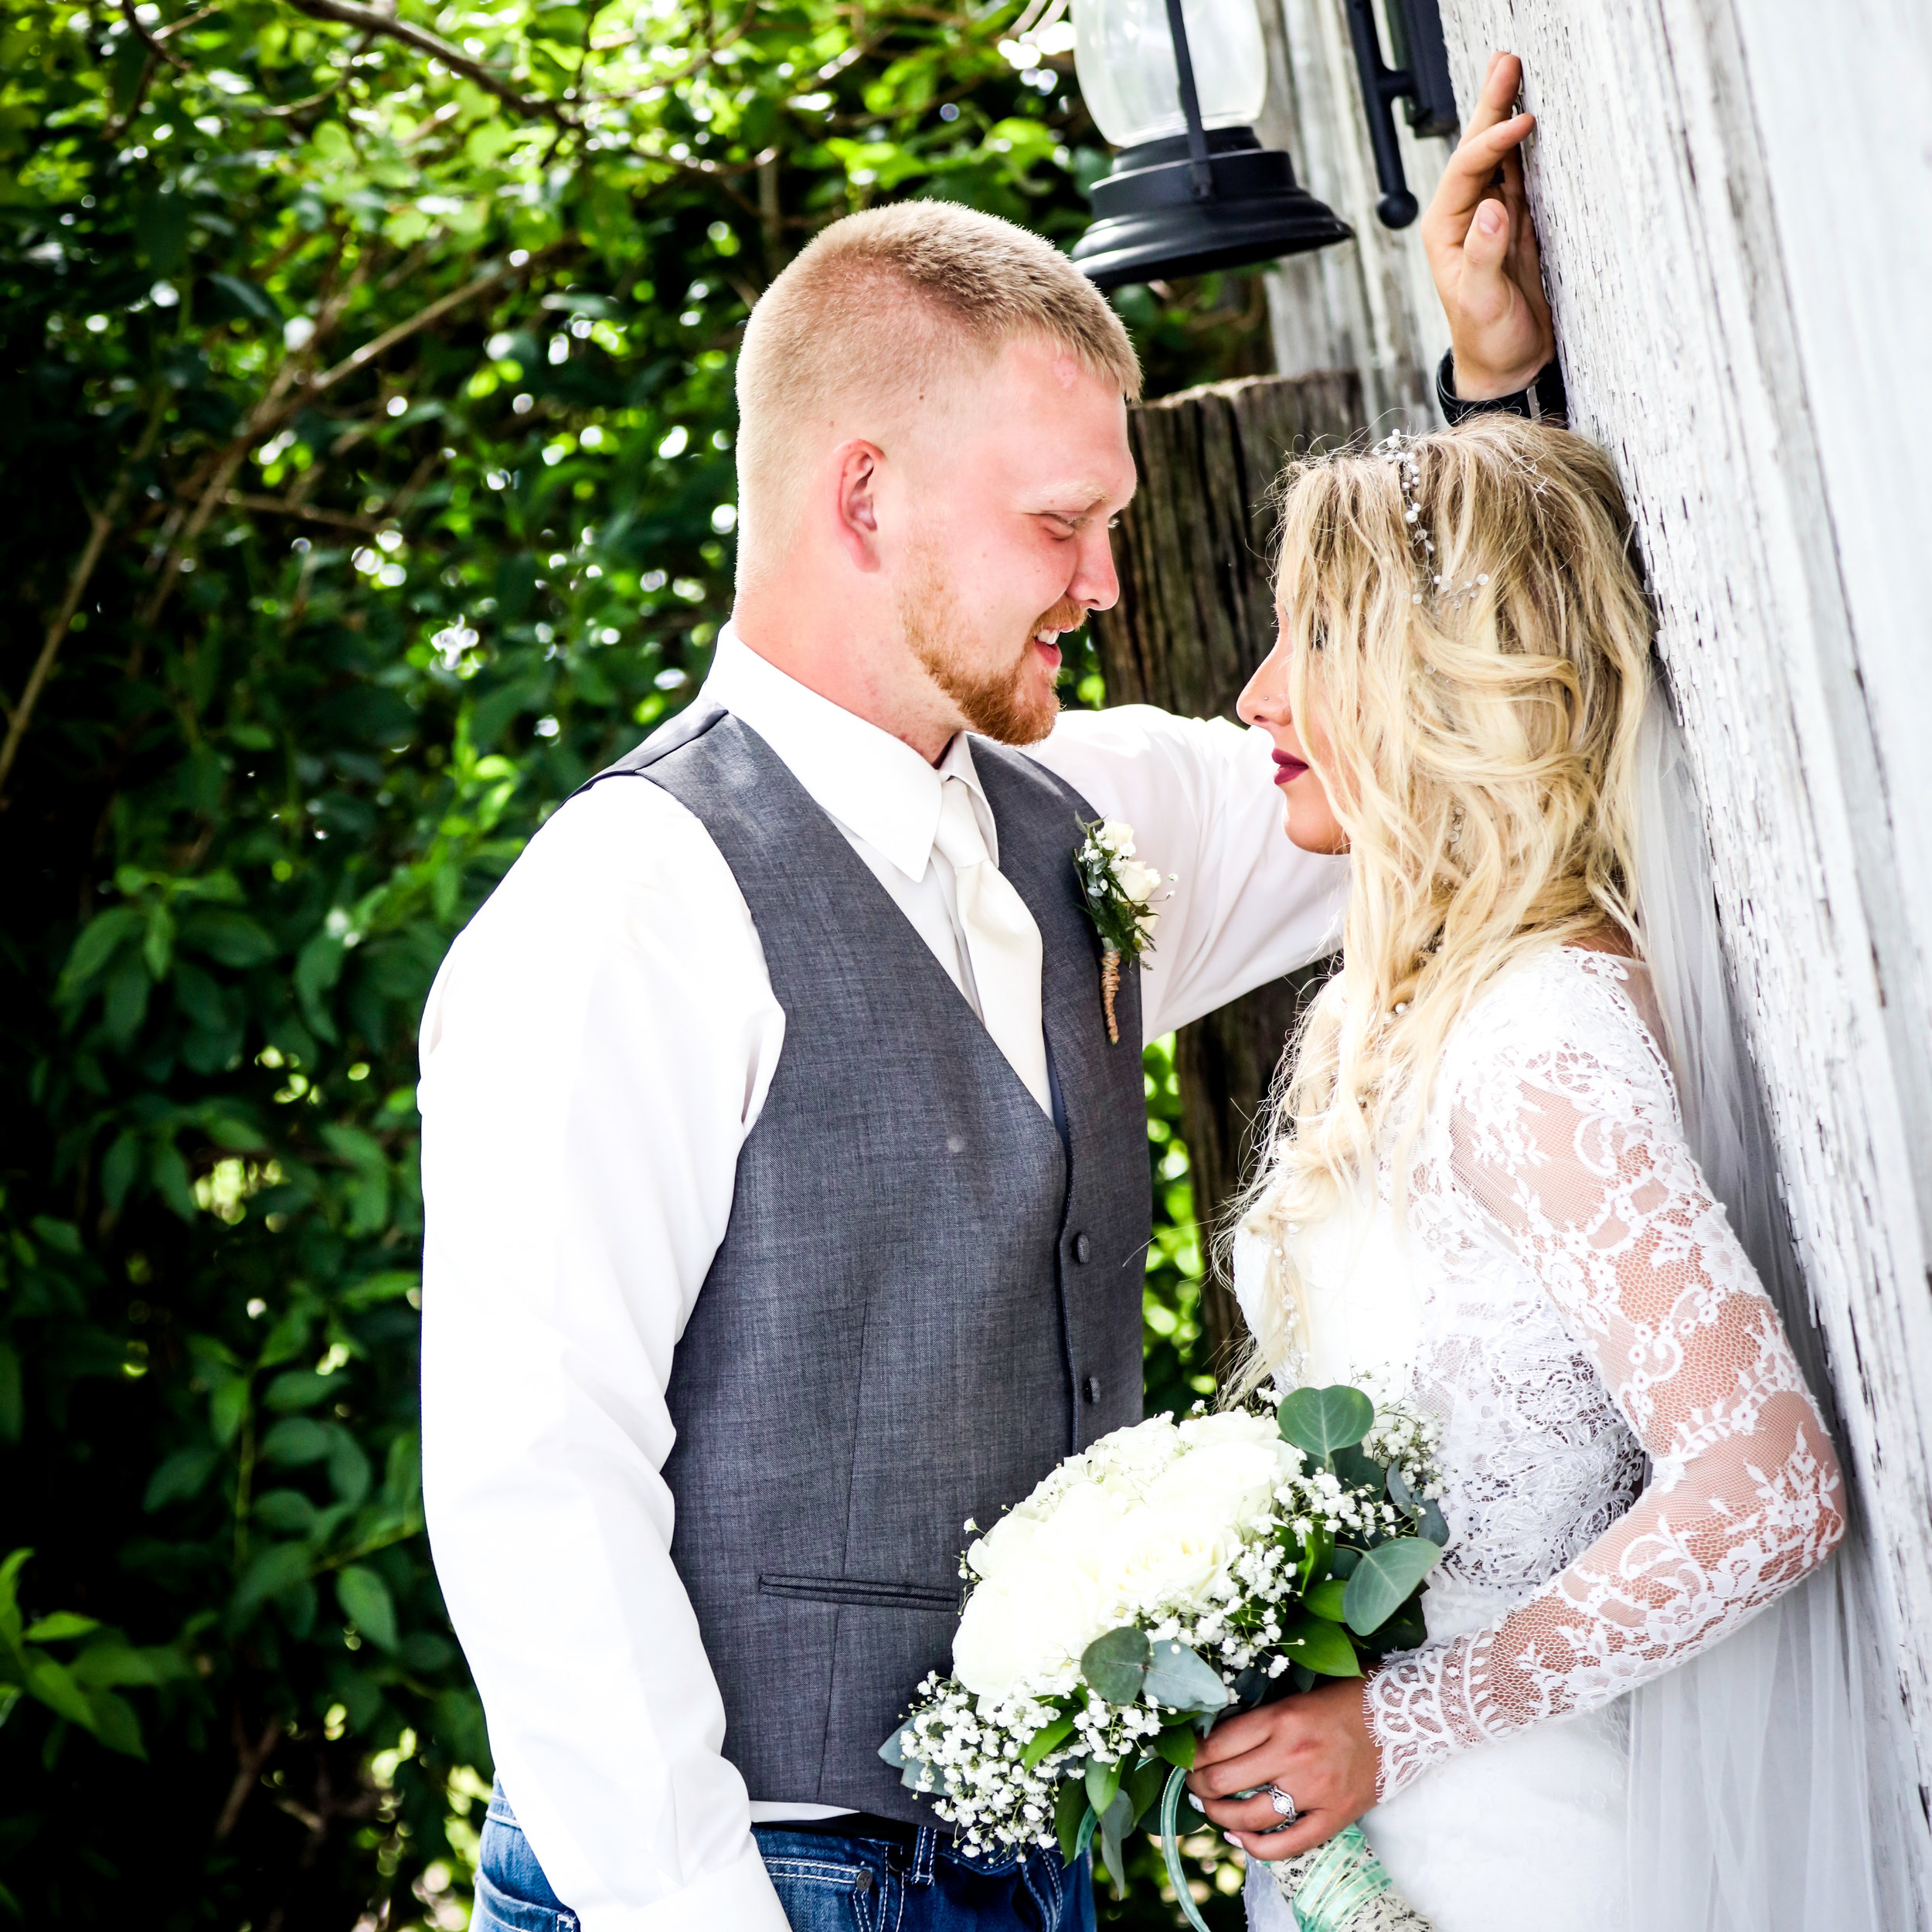 WeddingWebsite-34.jpg